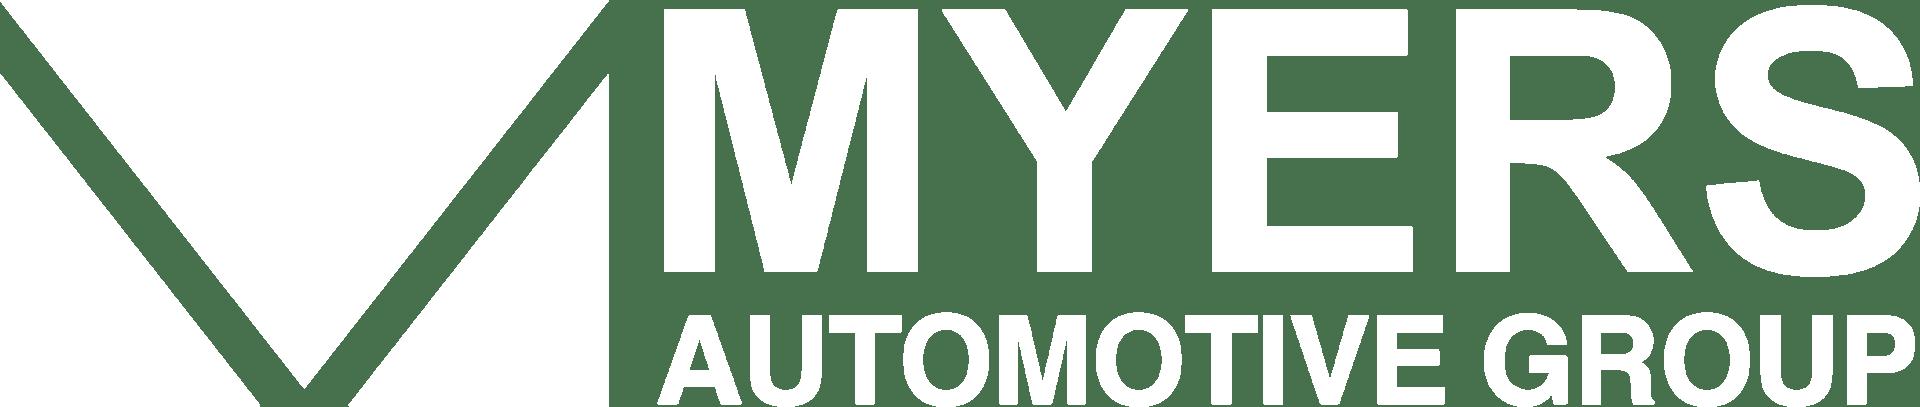 The Myers Automotive Group logo